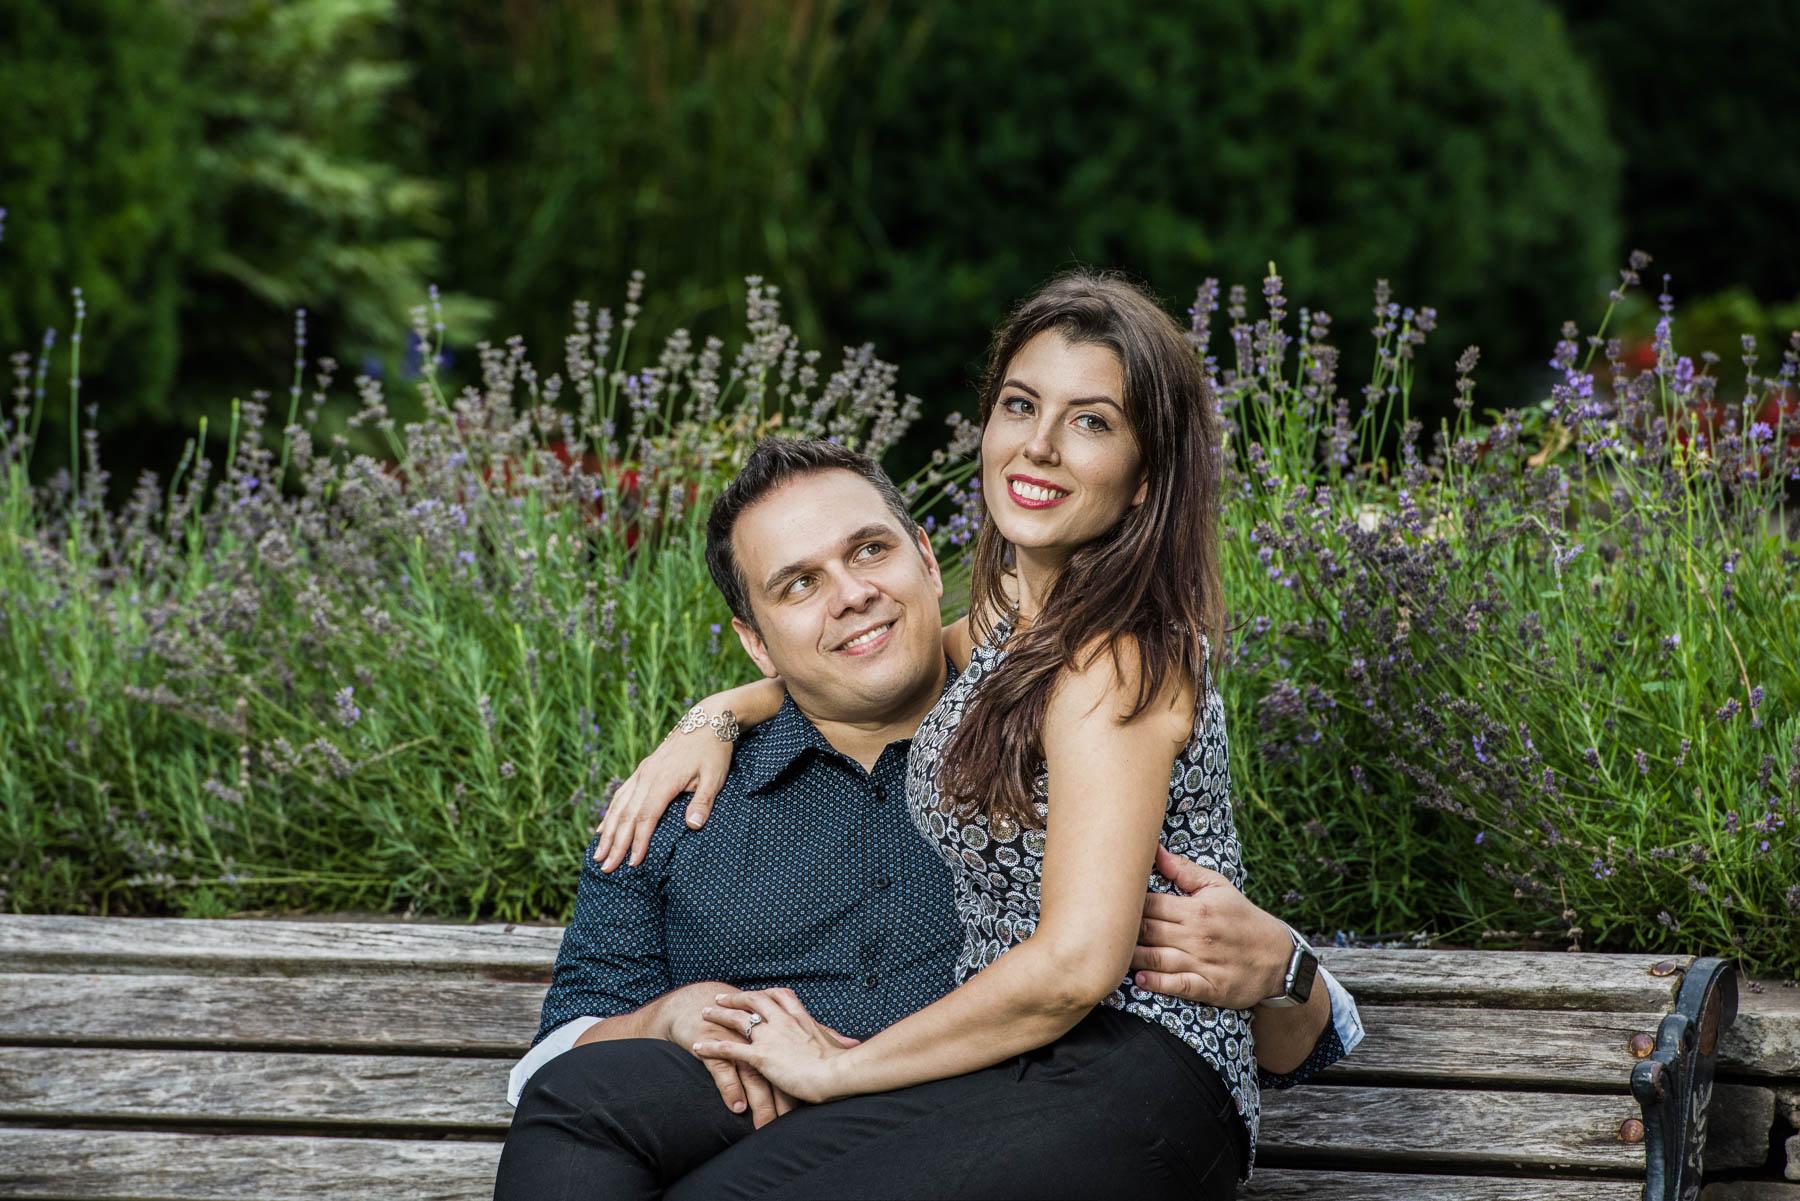 037 - Engagement JJ Alexander Muir Memorial Gardens